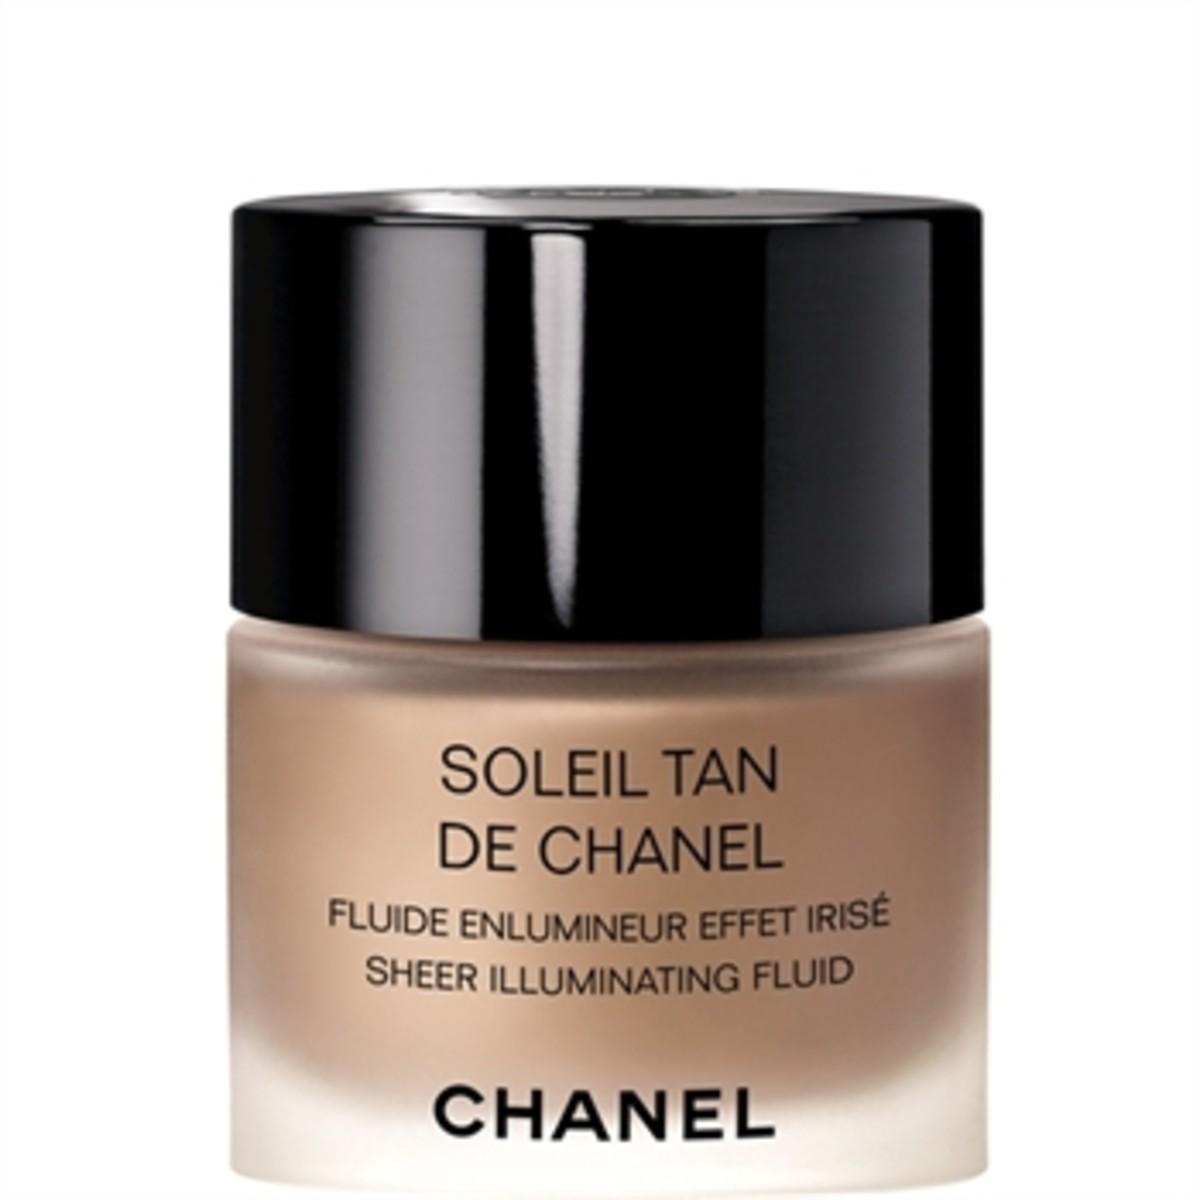 Chanel-Soleil-Tan